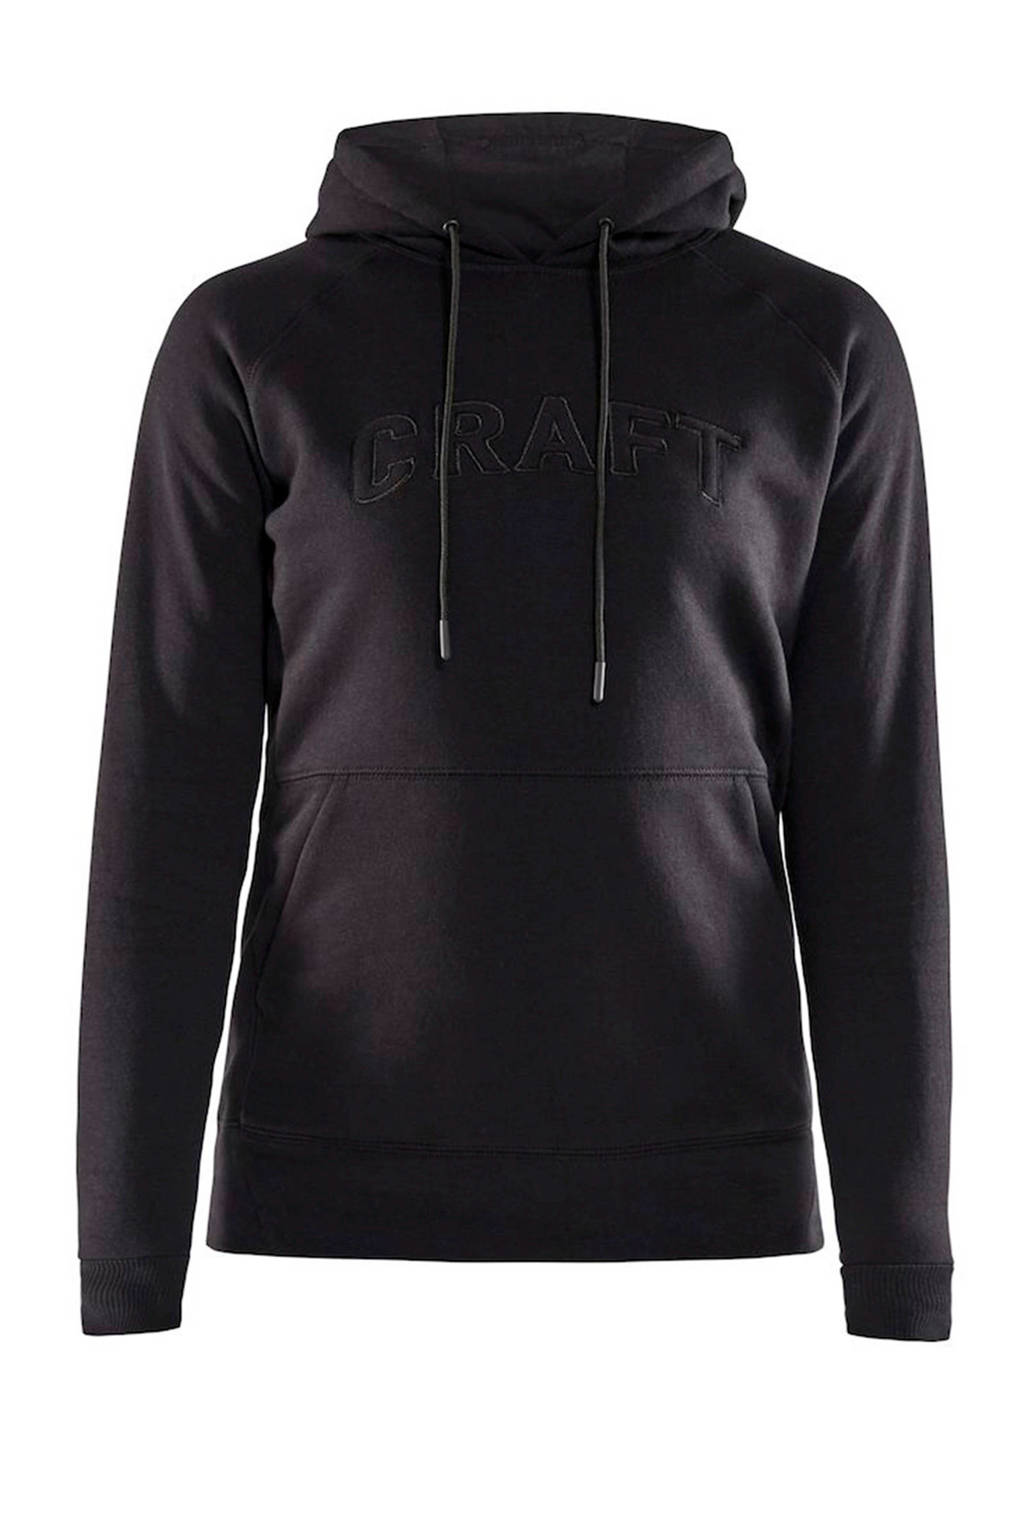 Craft hoodie zwart, Zwart